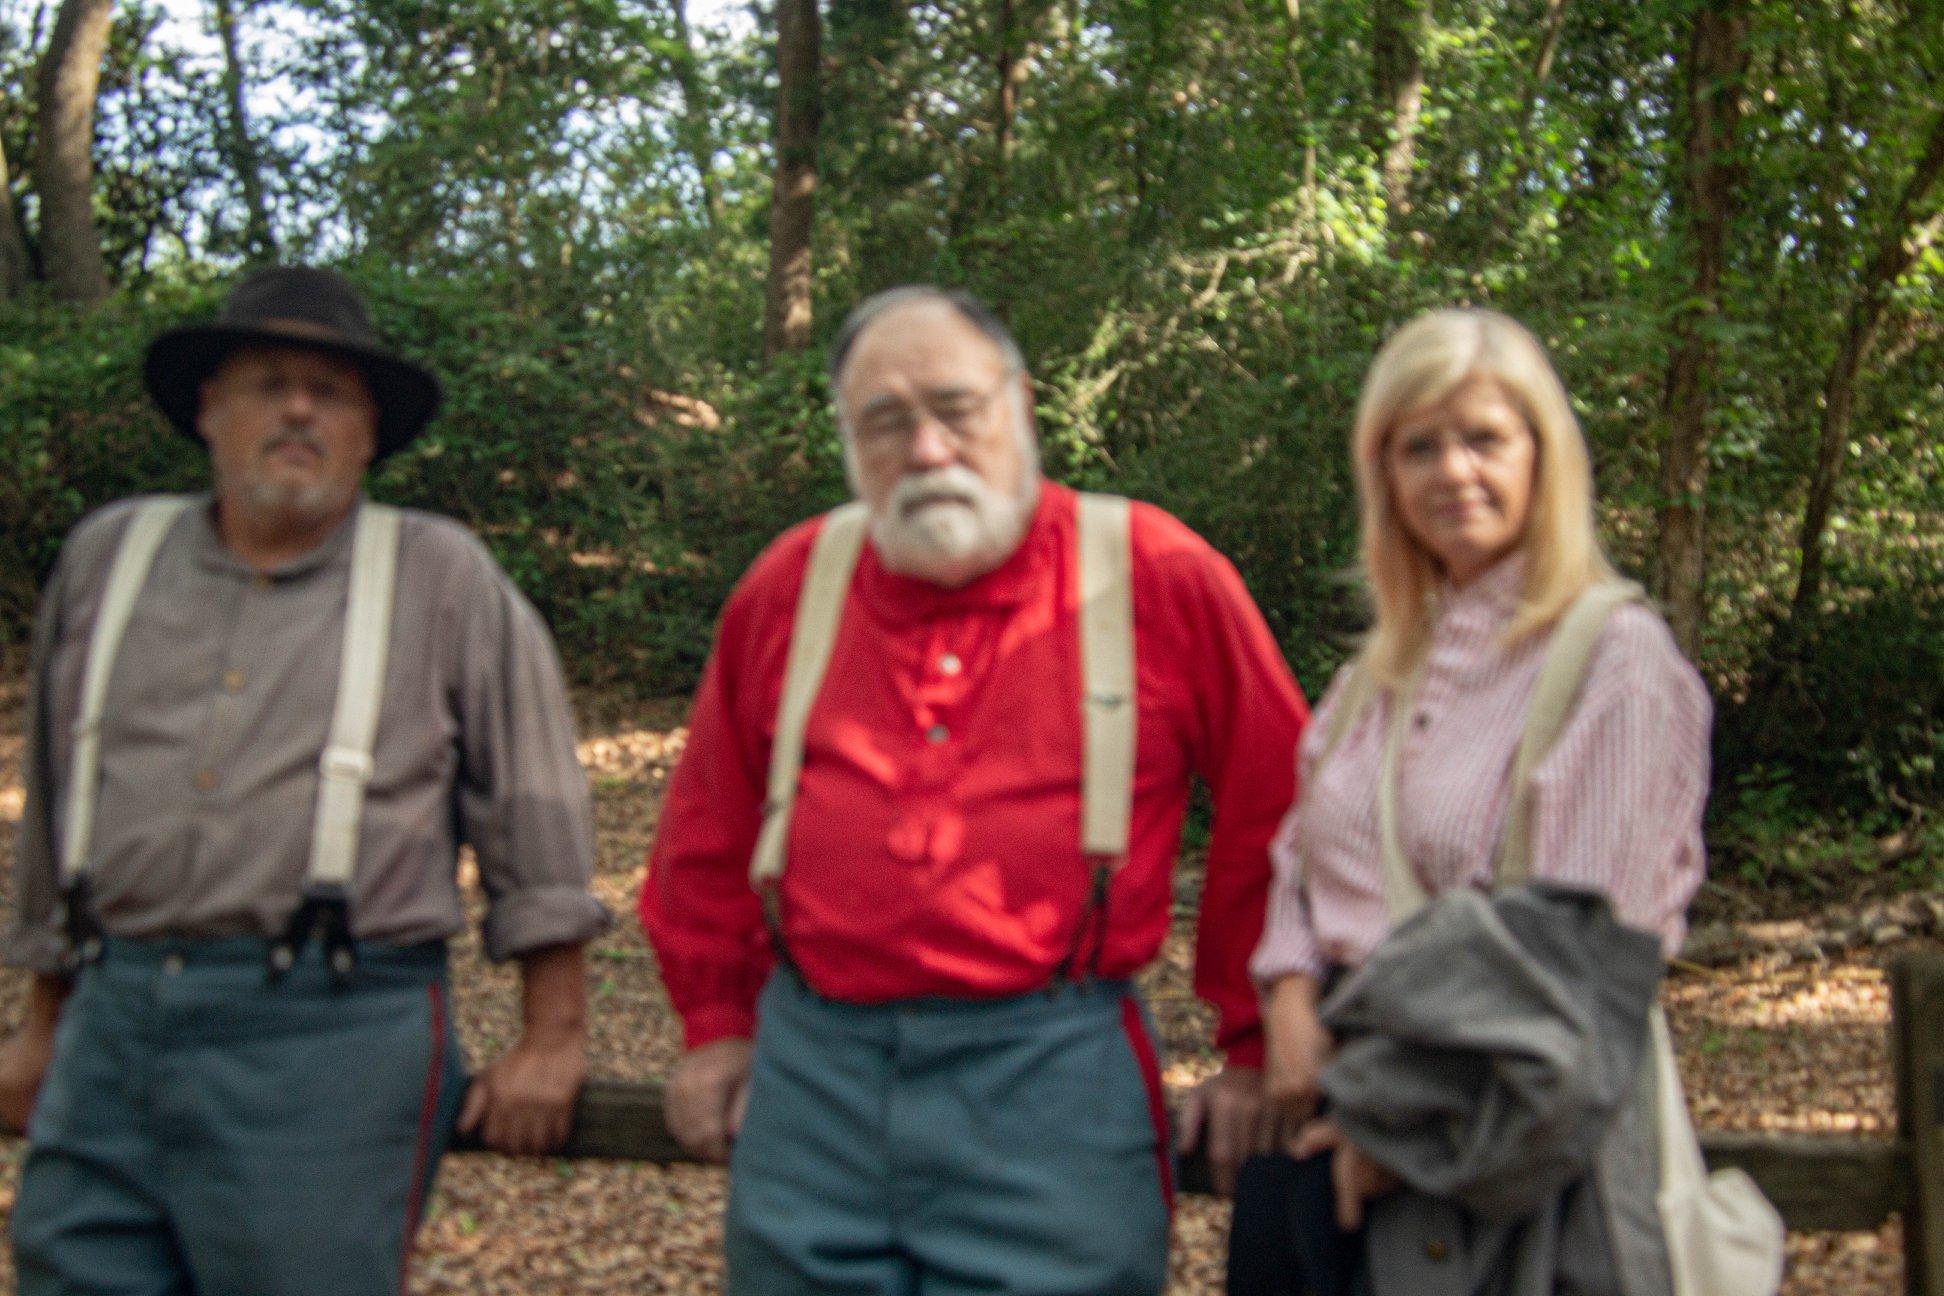 The annual anniversary of the Battle of Secessionville 5